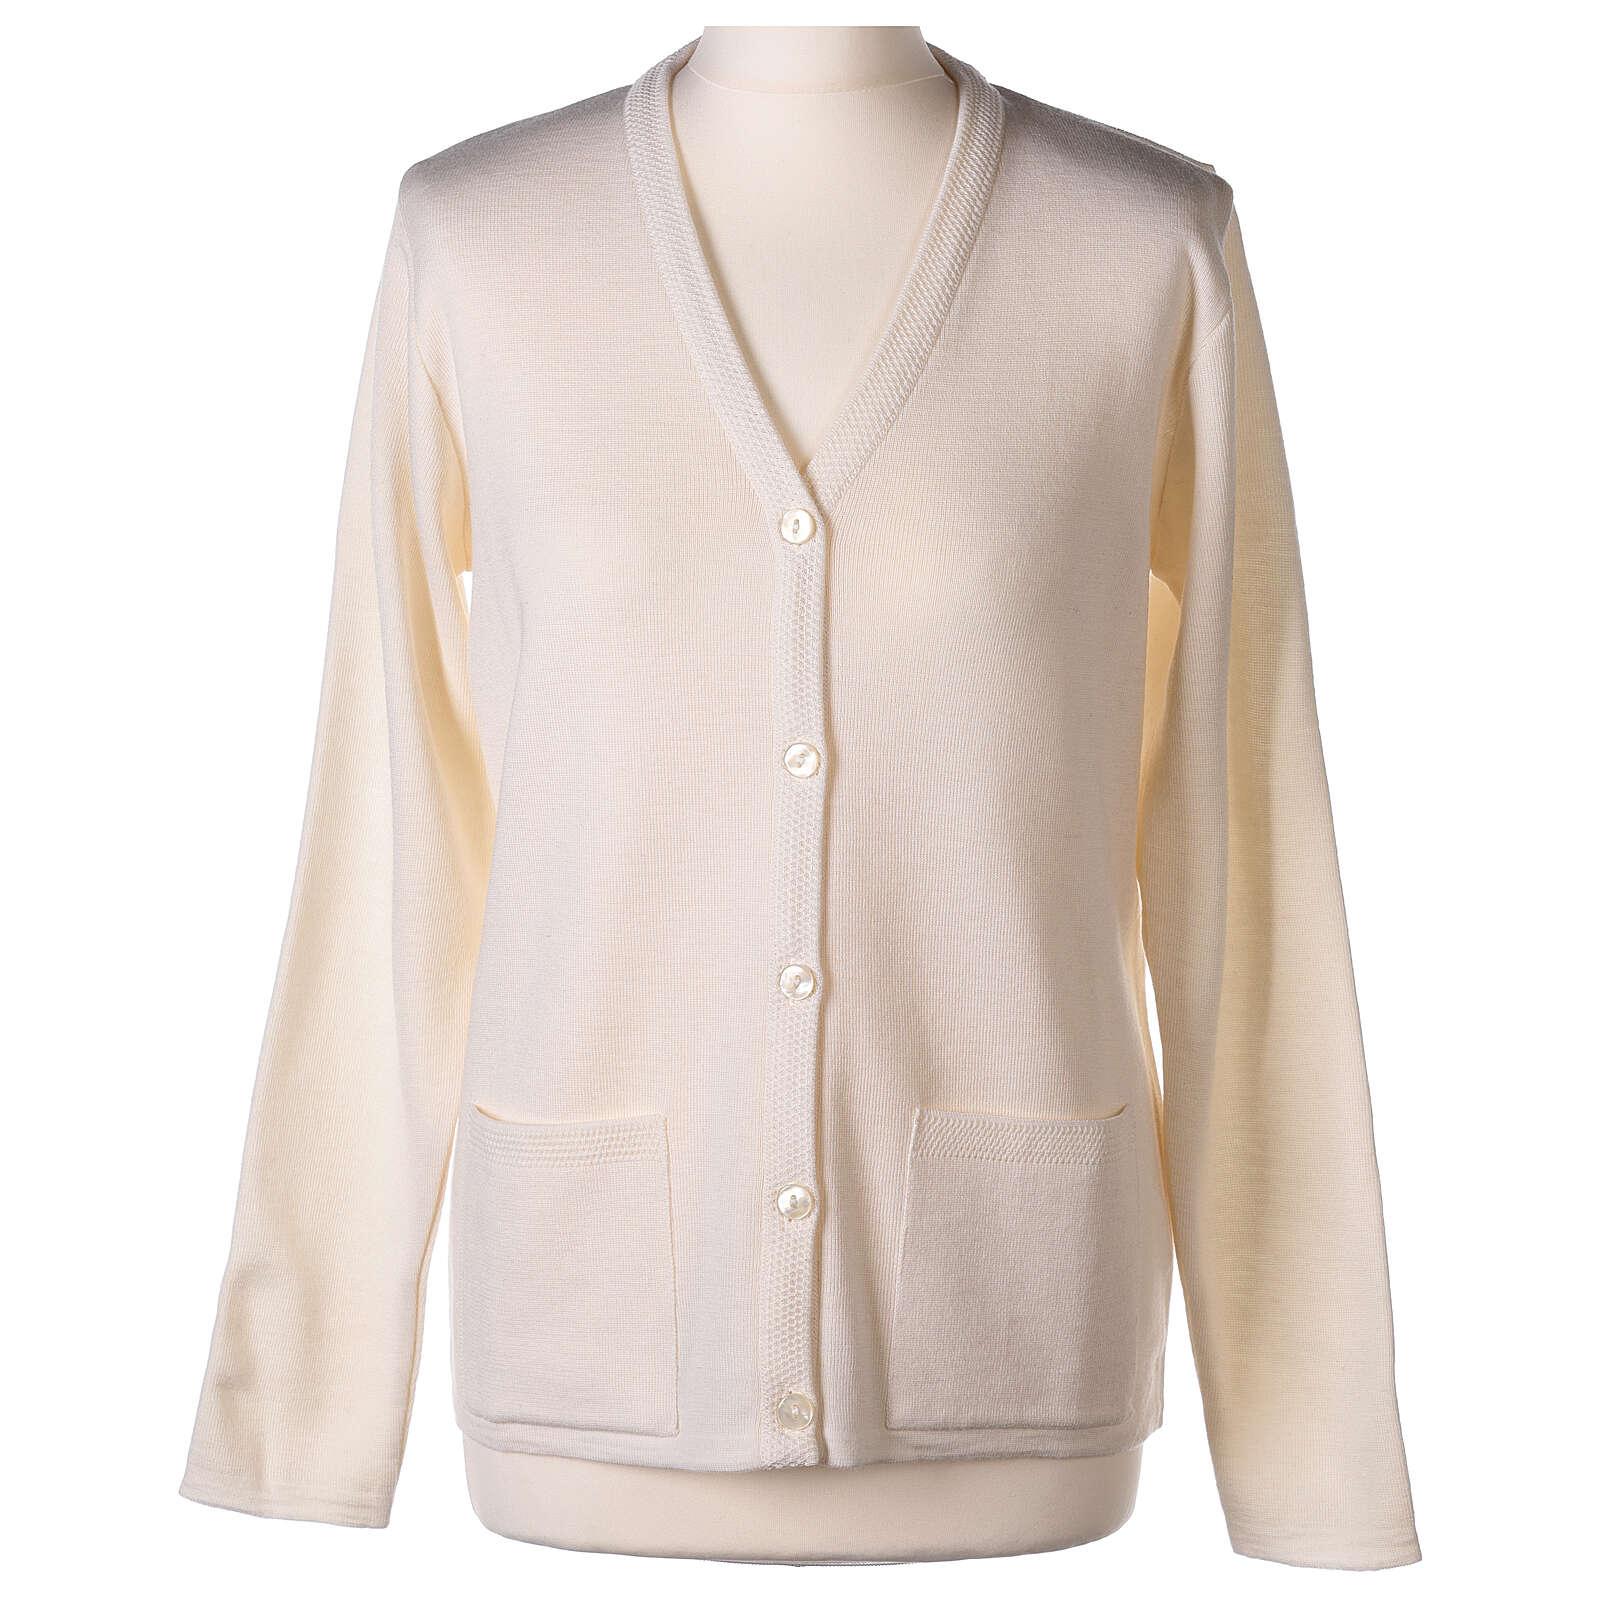 Cardigan soeur blanc col en V poches jersey 50% acrylique 50 laine mérinos In Primis 4